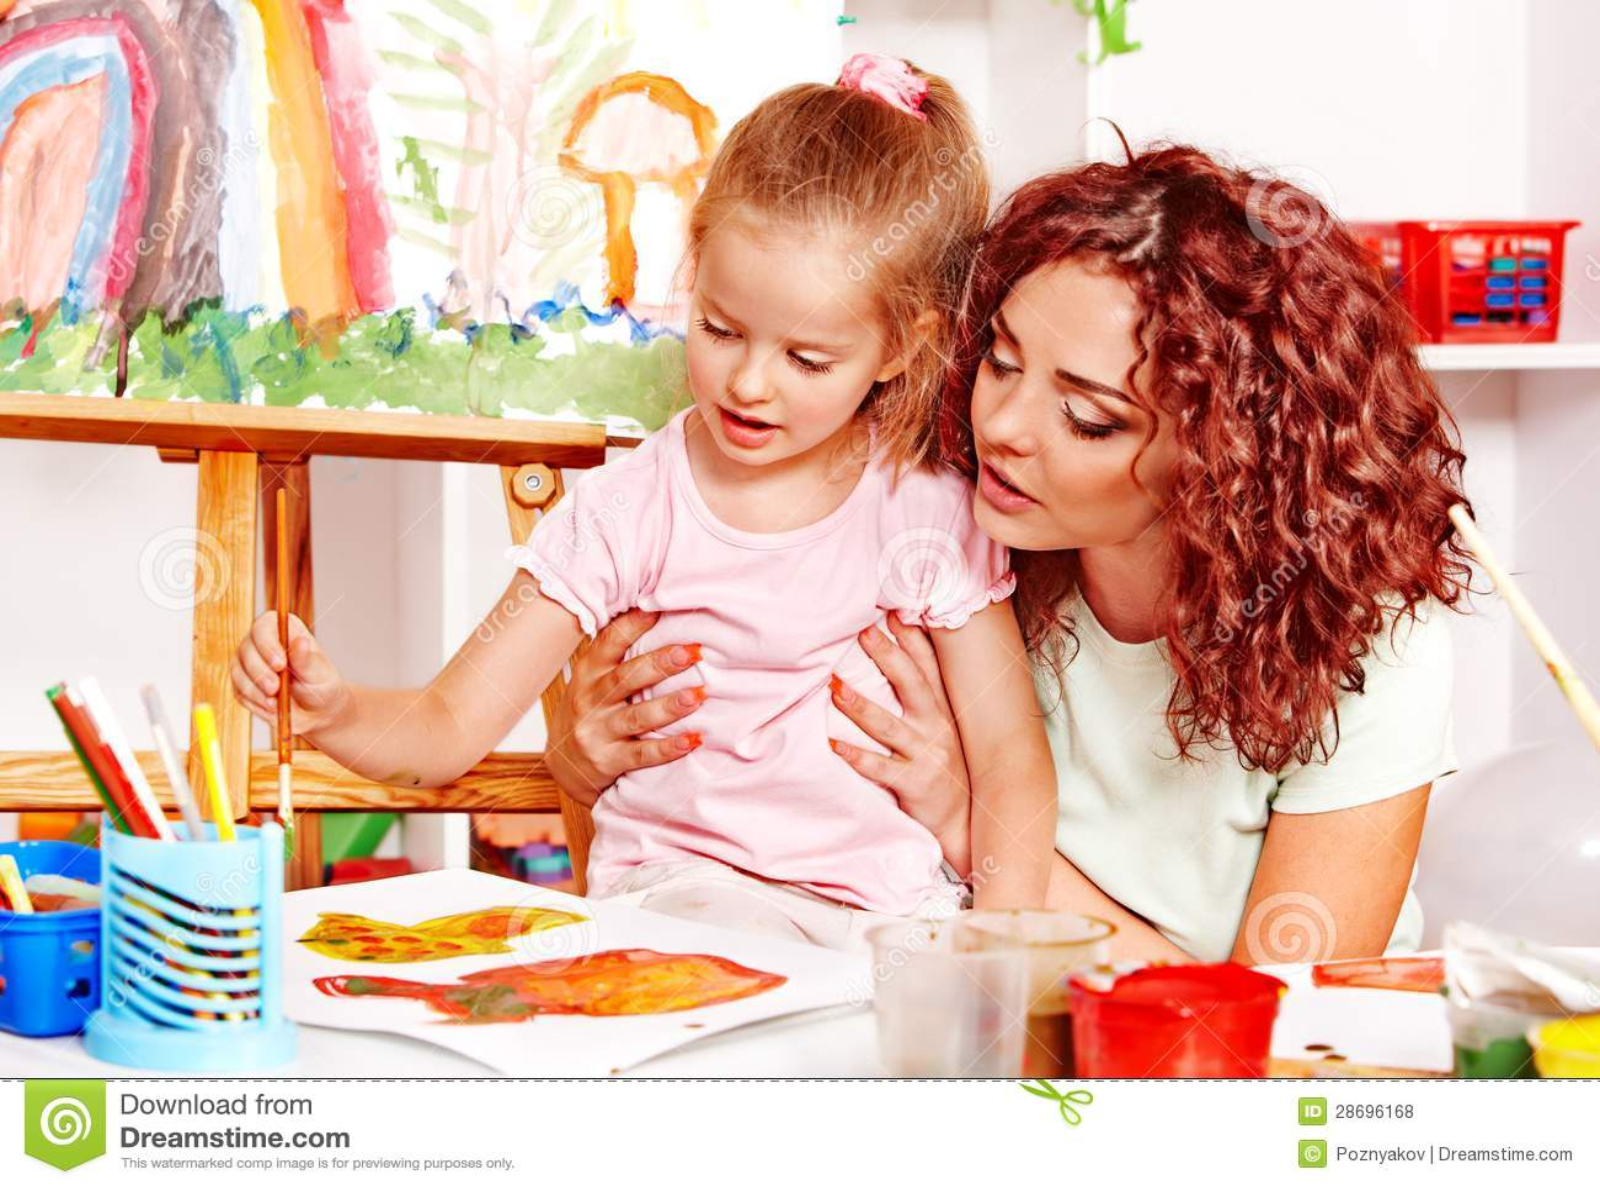 peinture d 39 enfant avec la momie photo stock image du gosse kindergarten 28696168. Black Bedroom Furniture Sets. Home Design Ideas